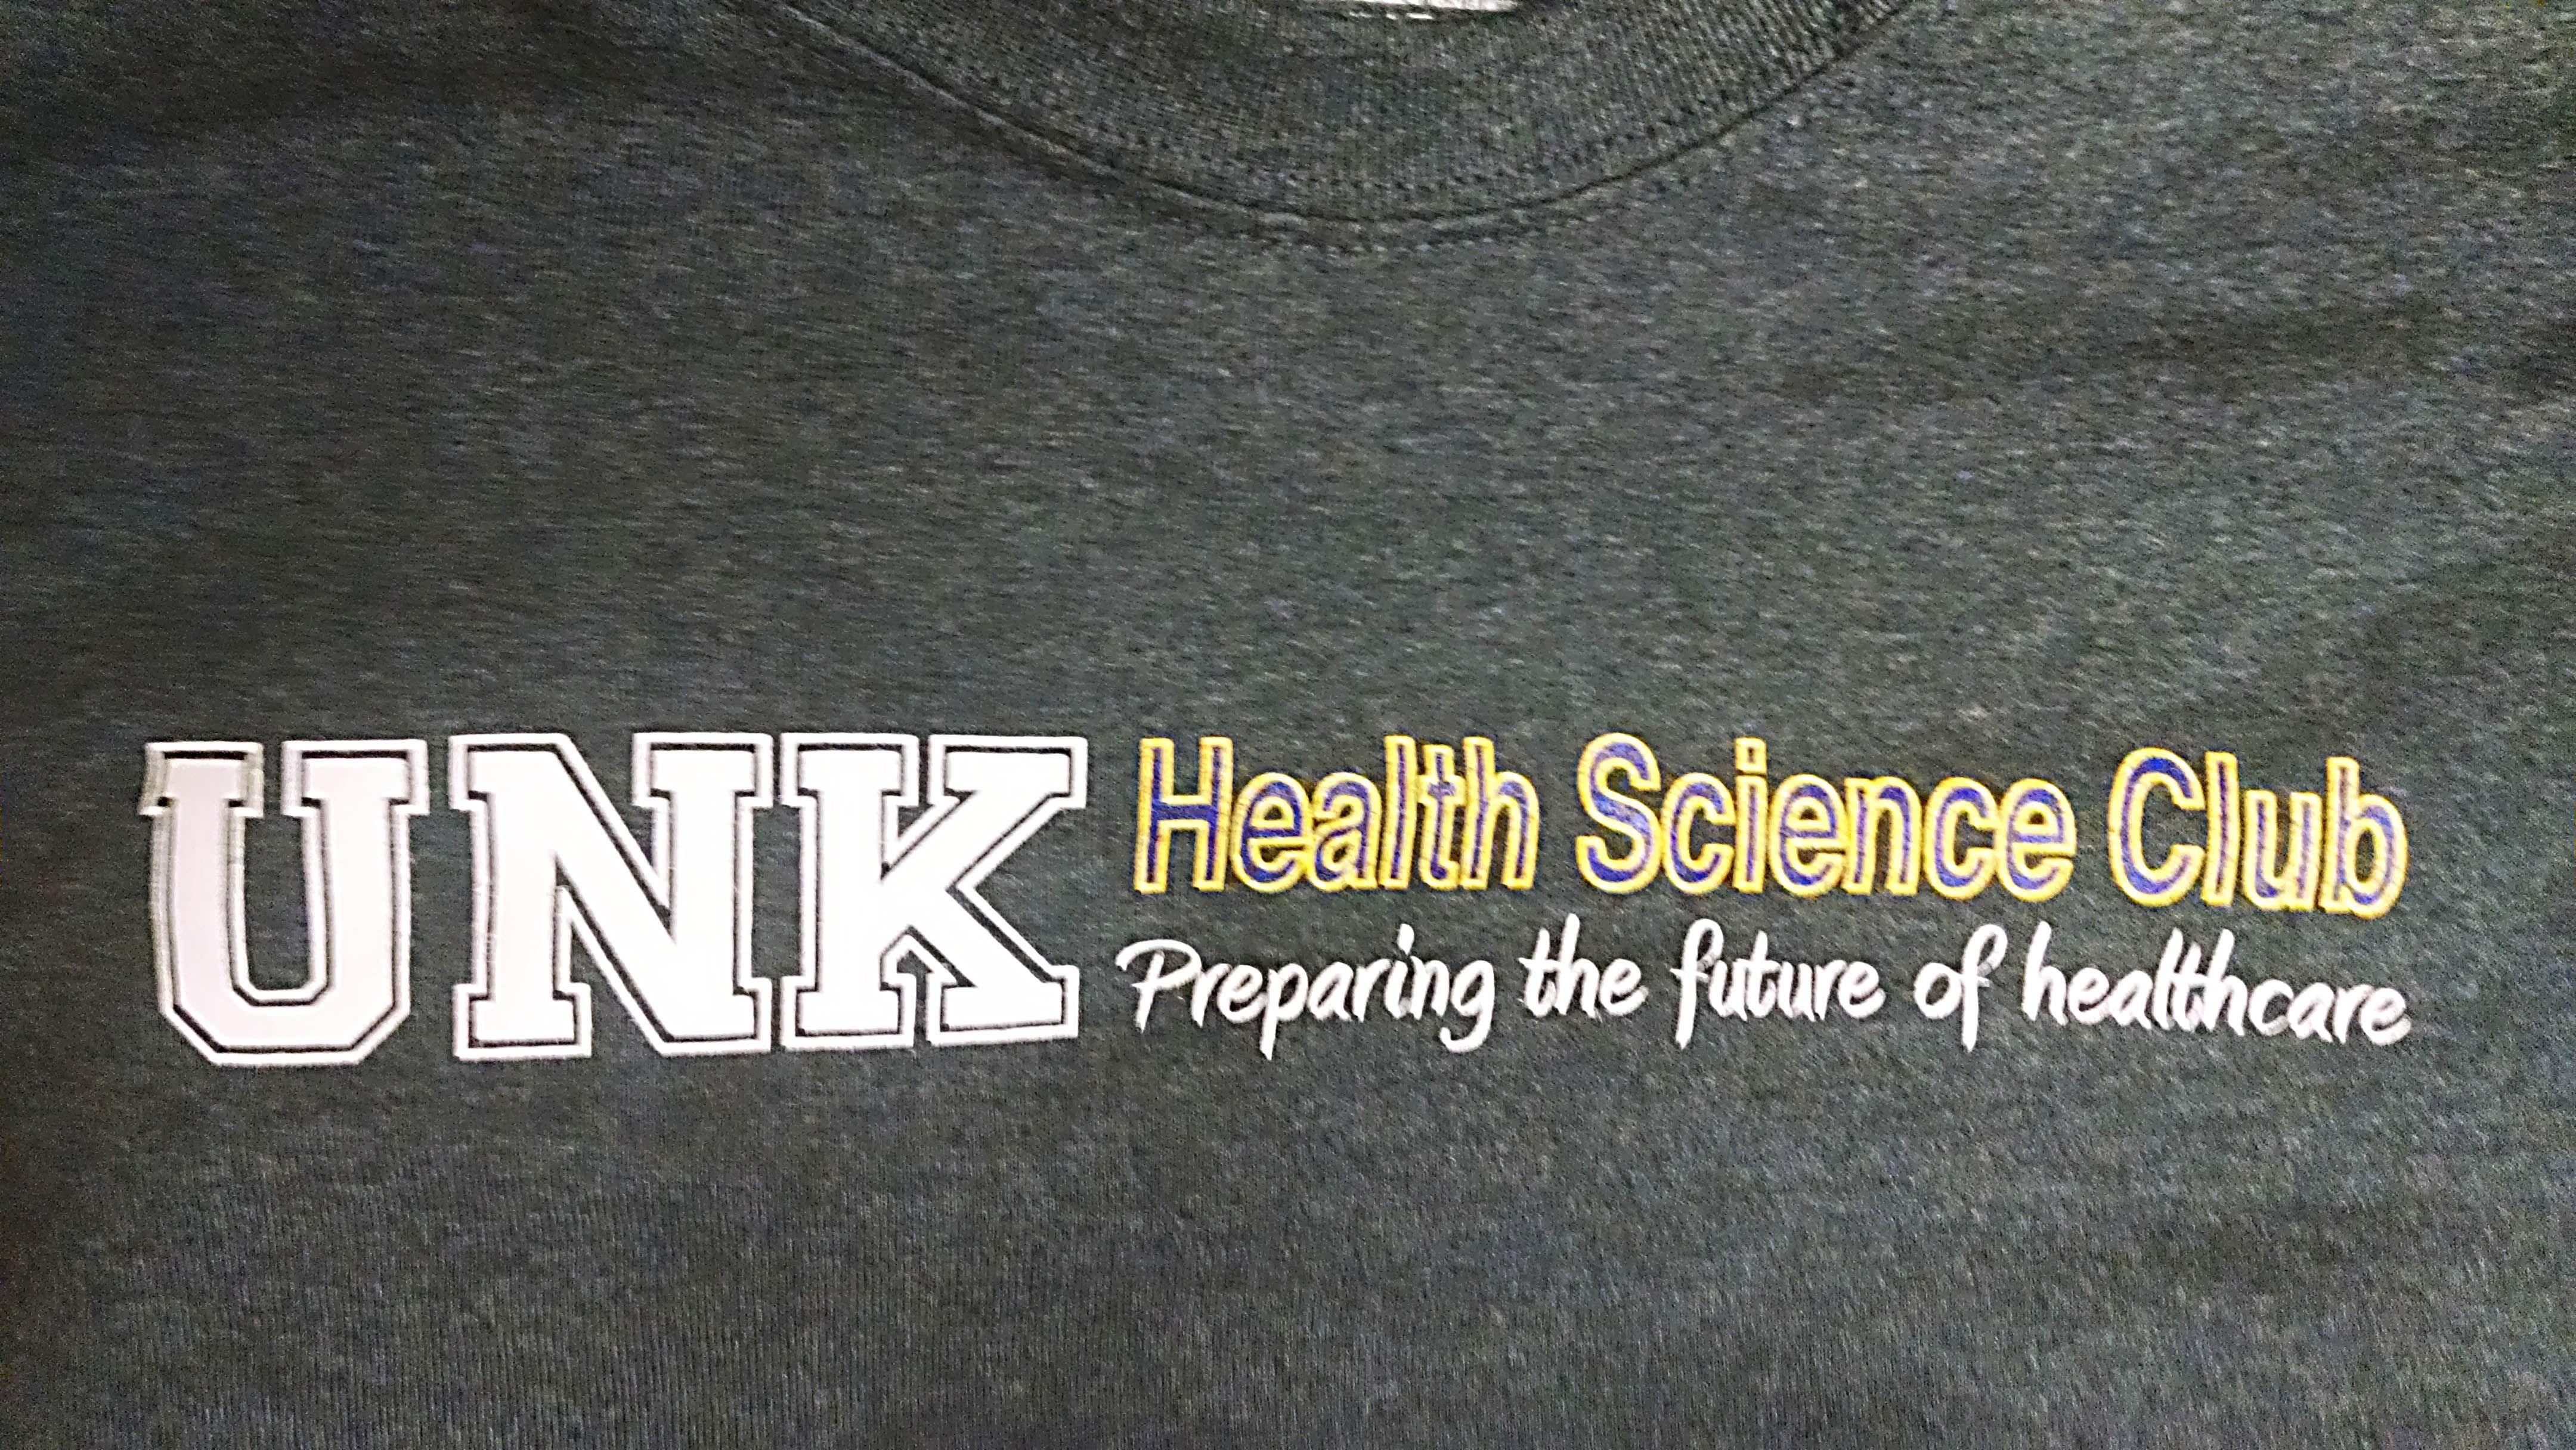 Unk Health Science Club University Of Nebraska At Kearney Apparel T Shirt Tee Shirt Design Screen Print Sc Tee Shirt Designs Shirts Shirt Designs